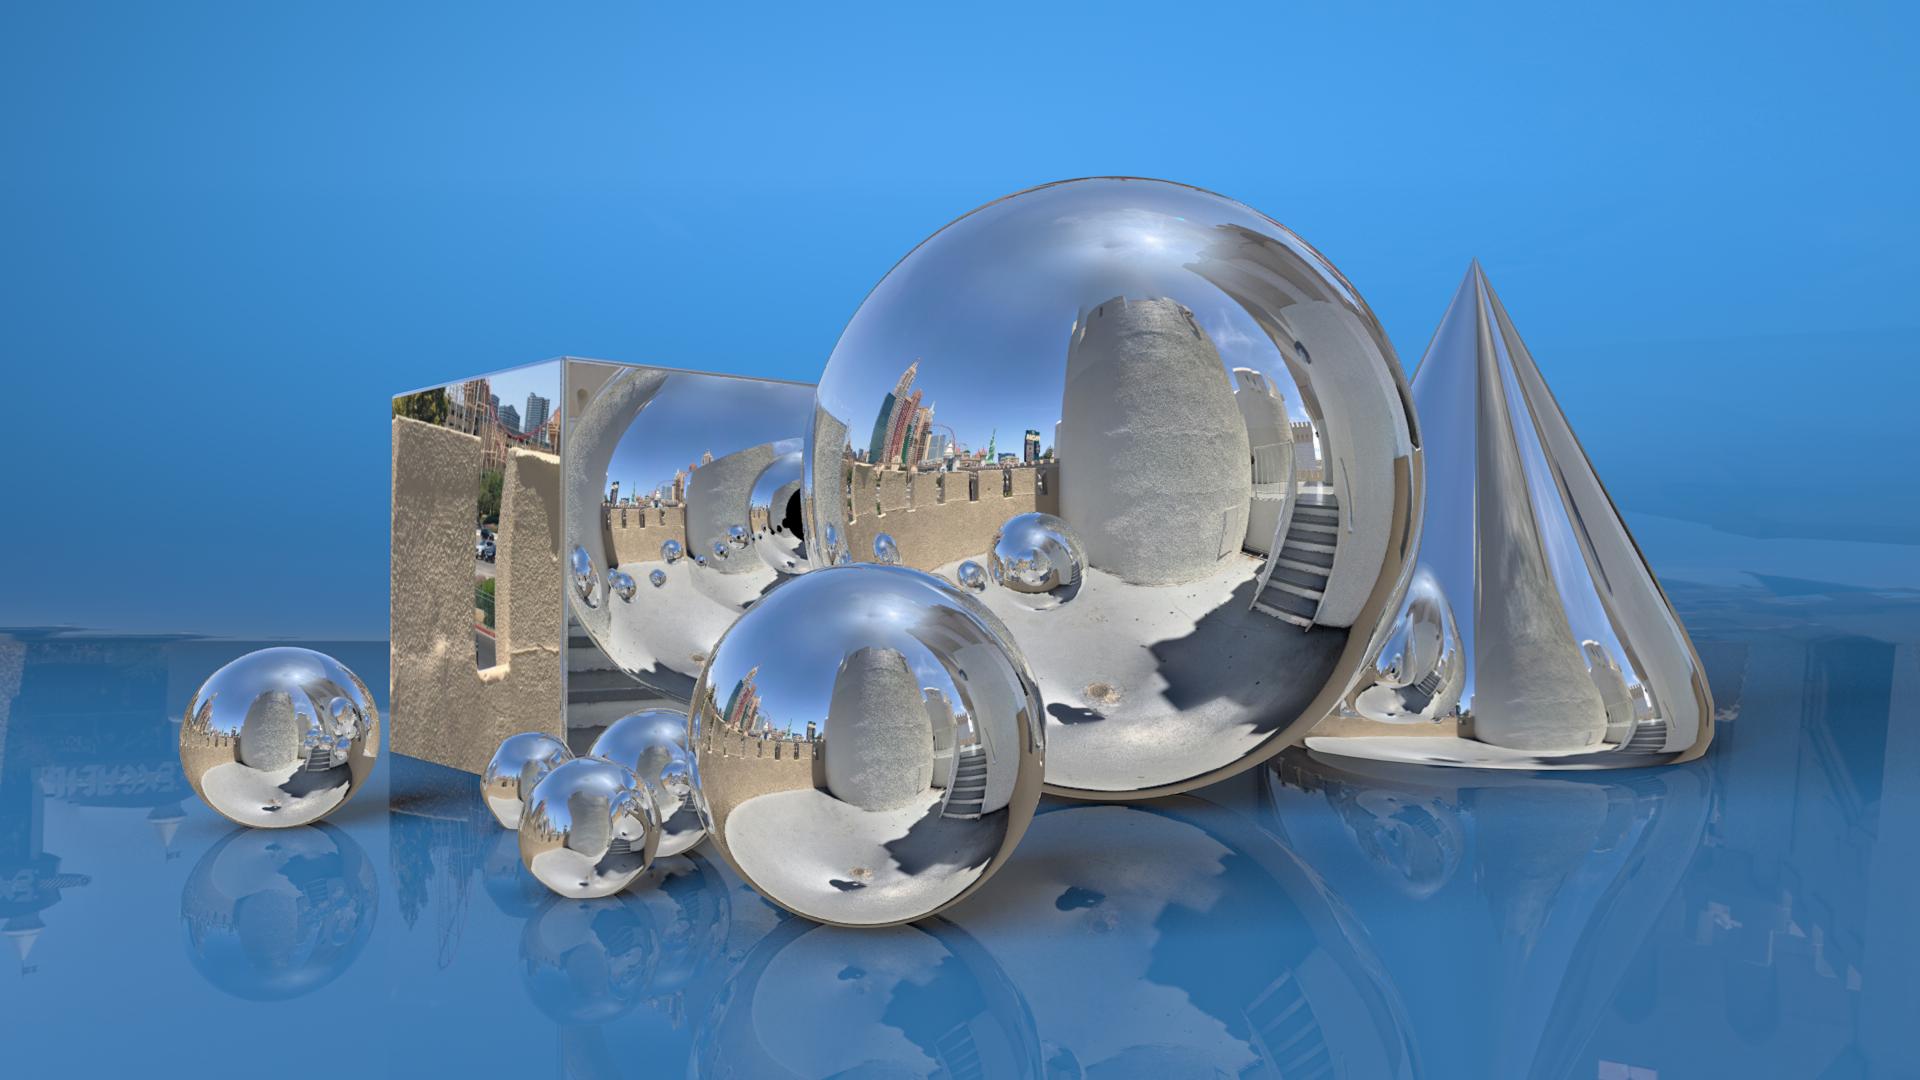 Excalibur_Castle_RENDER.png